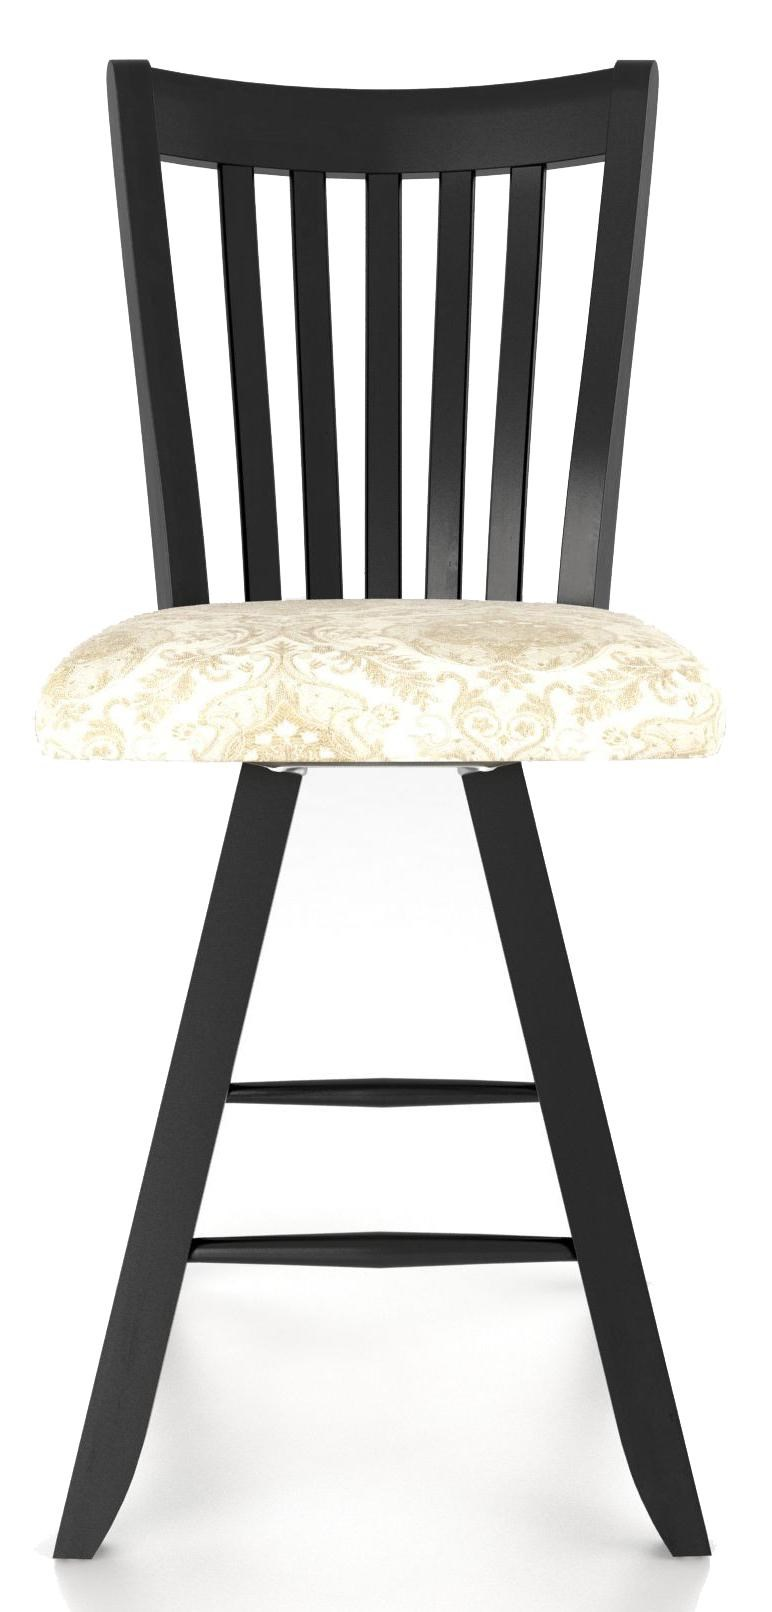 Canadel Bar Stools Customizable 24quot Upholstered Swivel  : bar20stools20stosto00119az05m24s b0jpgscalebothampwidth500ampheight500ampfsharpen25ampdown from www.dunkandbright.com size 500 x 500 jpeg 21kB